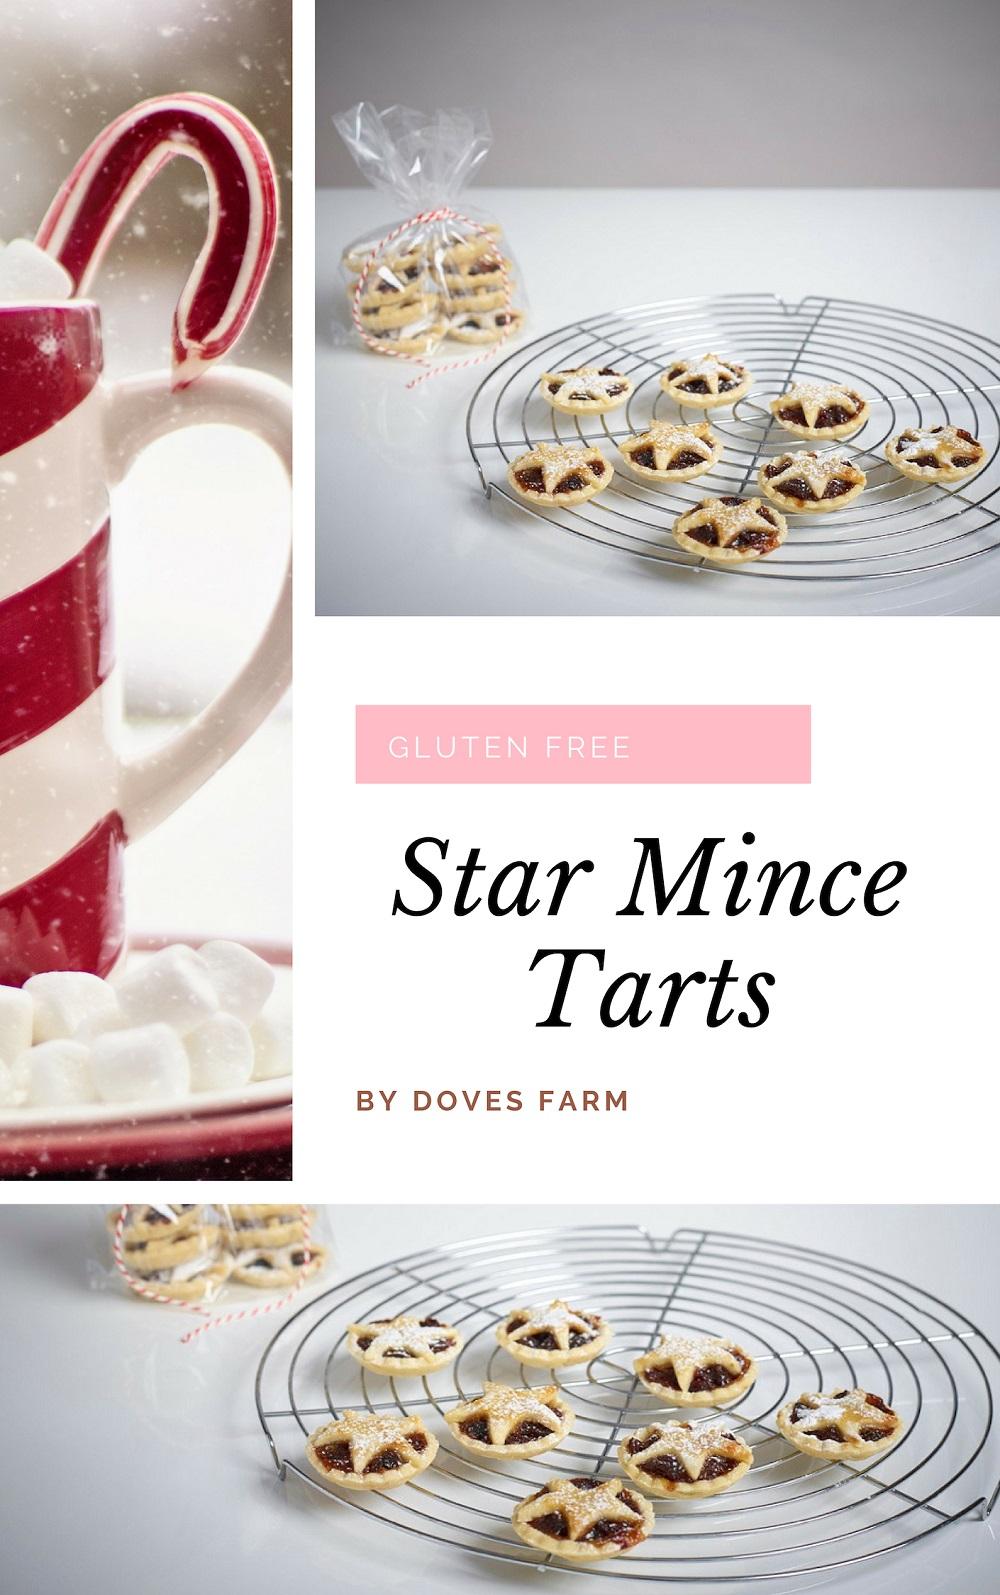 Gluten Free Star Mince Tarts